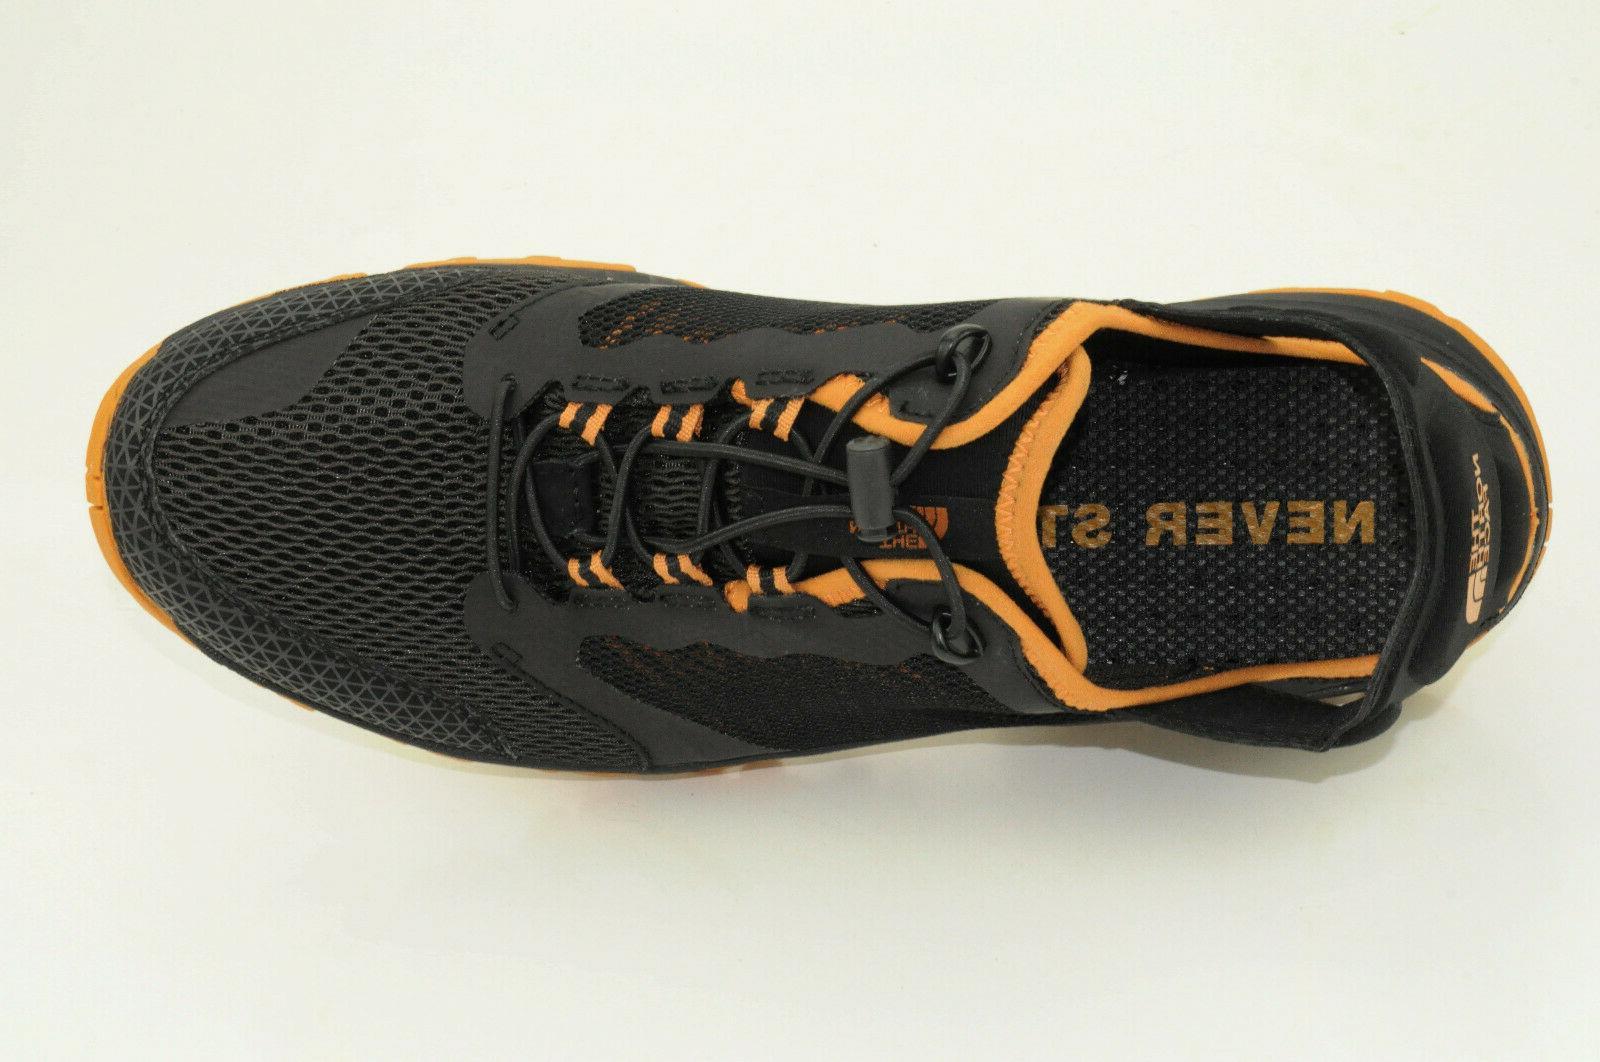 The Litewave Amphibious II Trekking Shoes Men